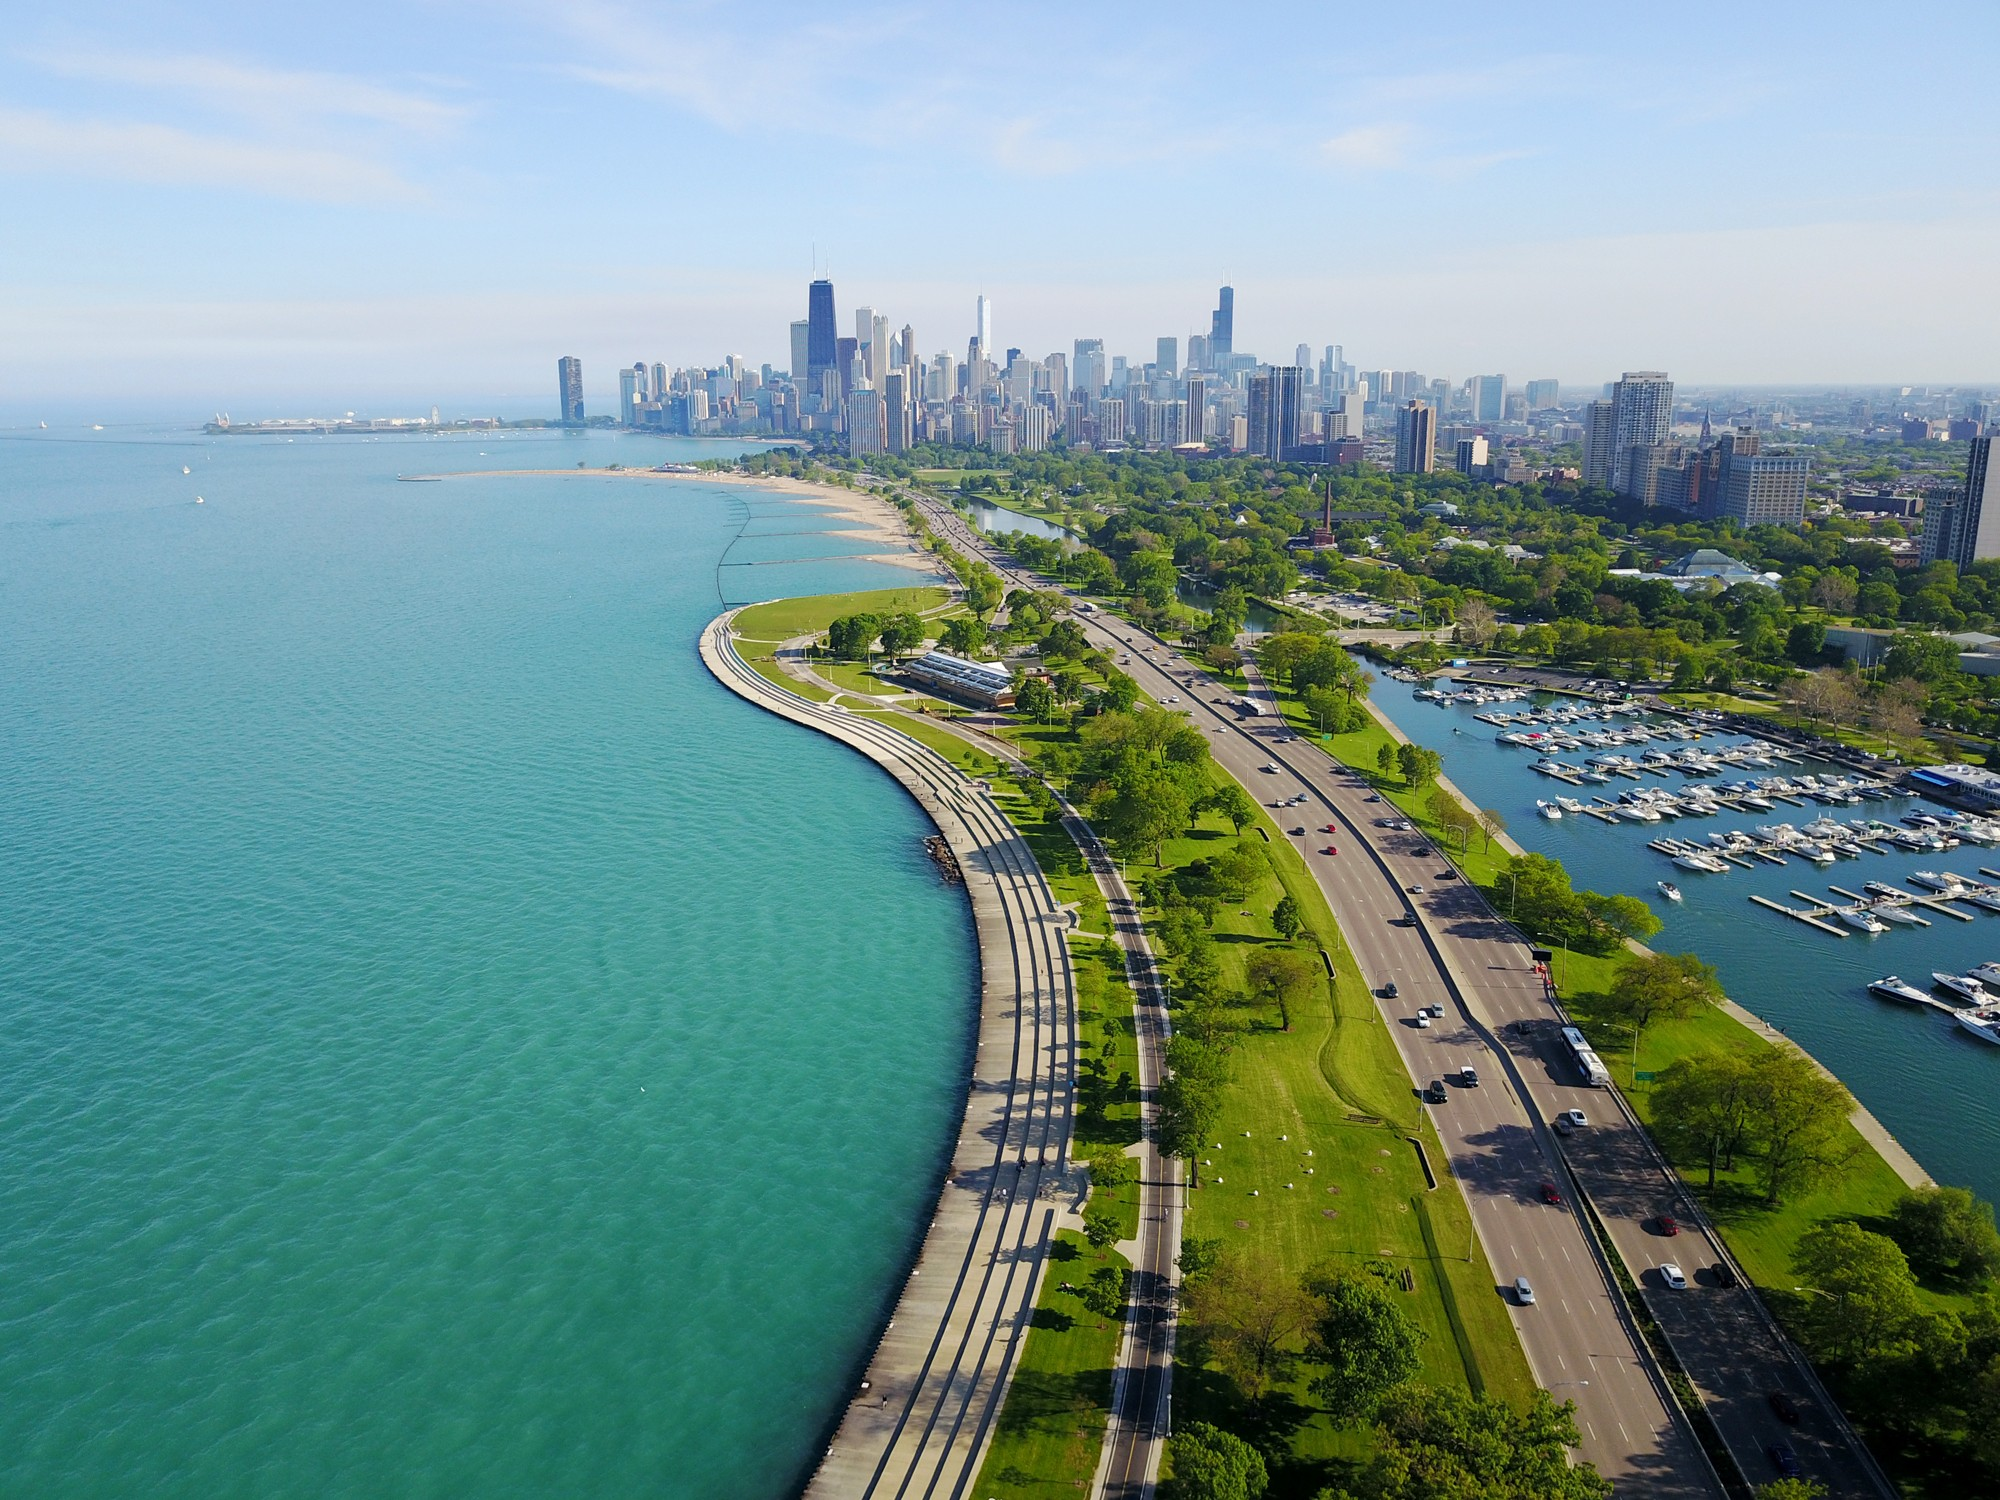 Lakefront Chicago Limousine Service